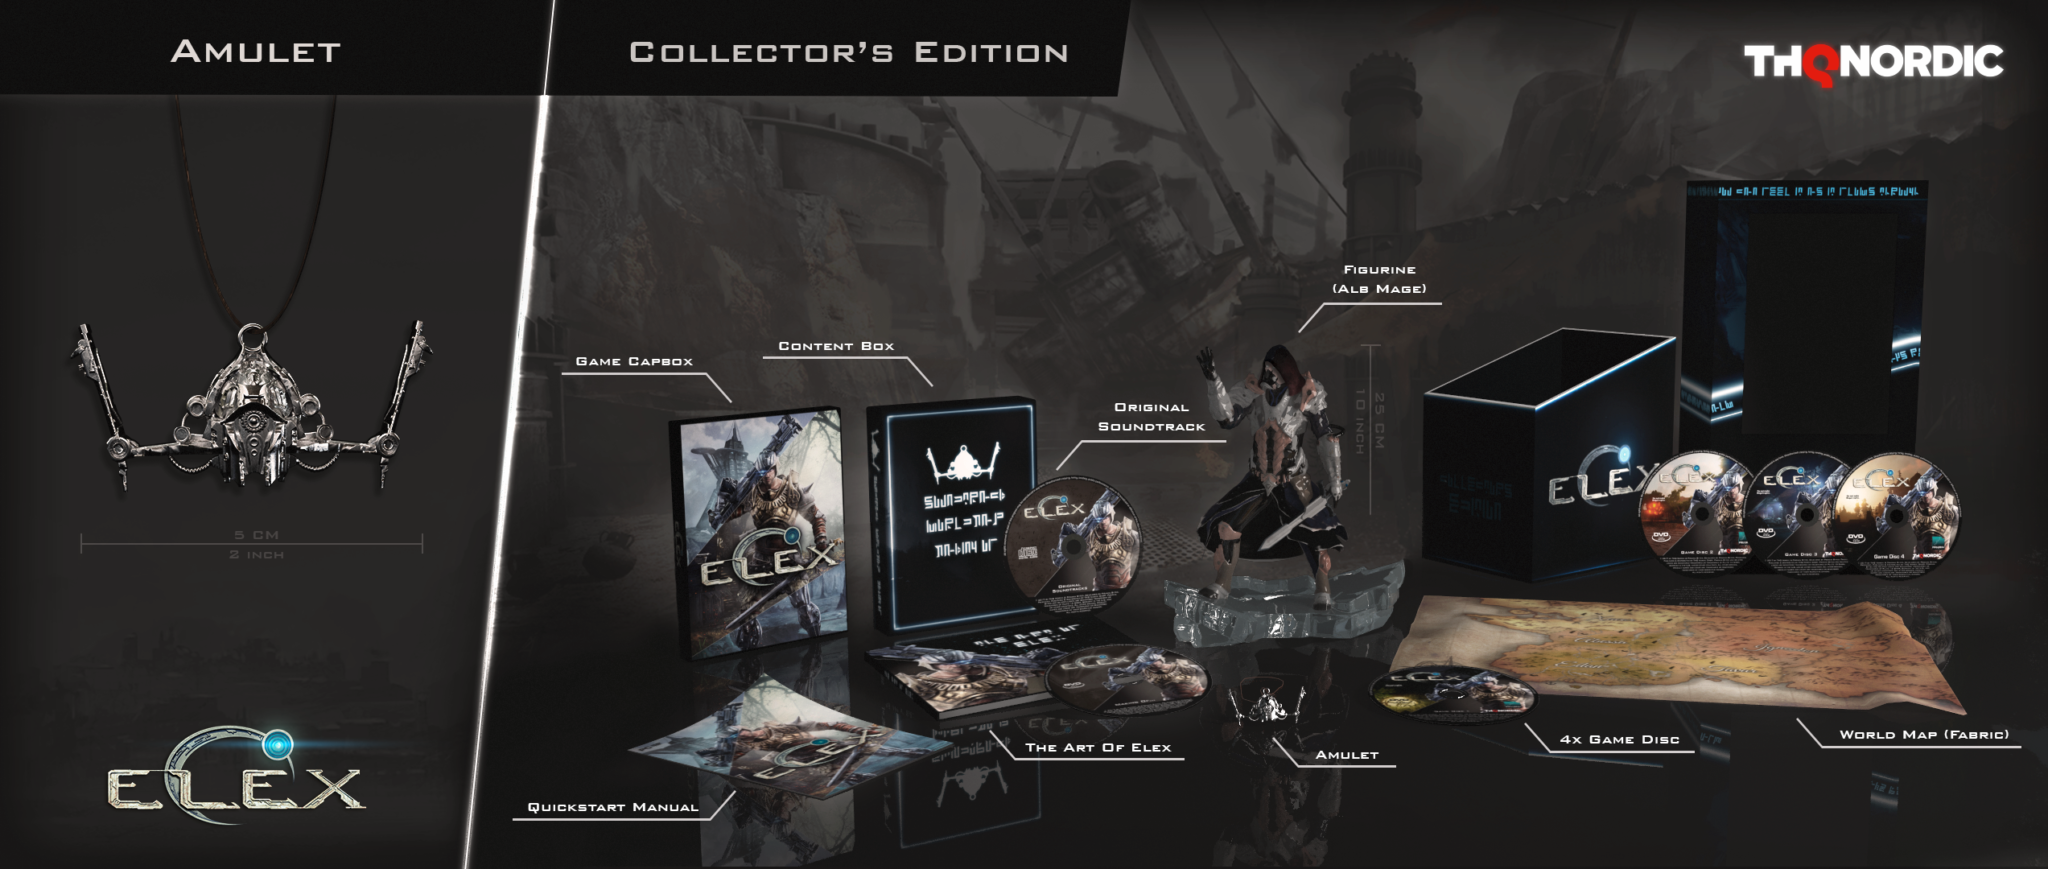 ELEX Collector's Edition